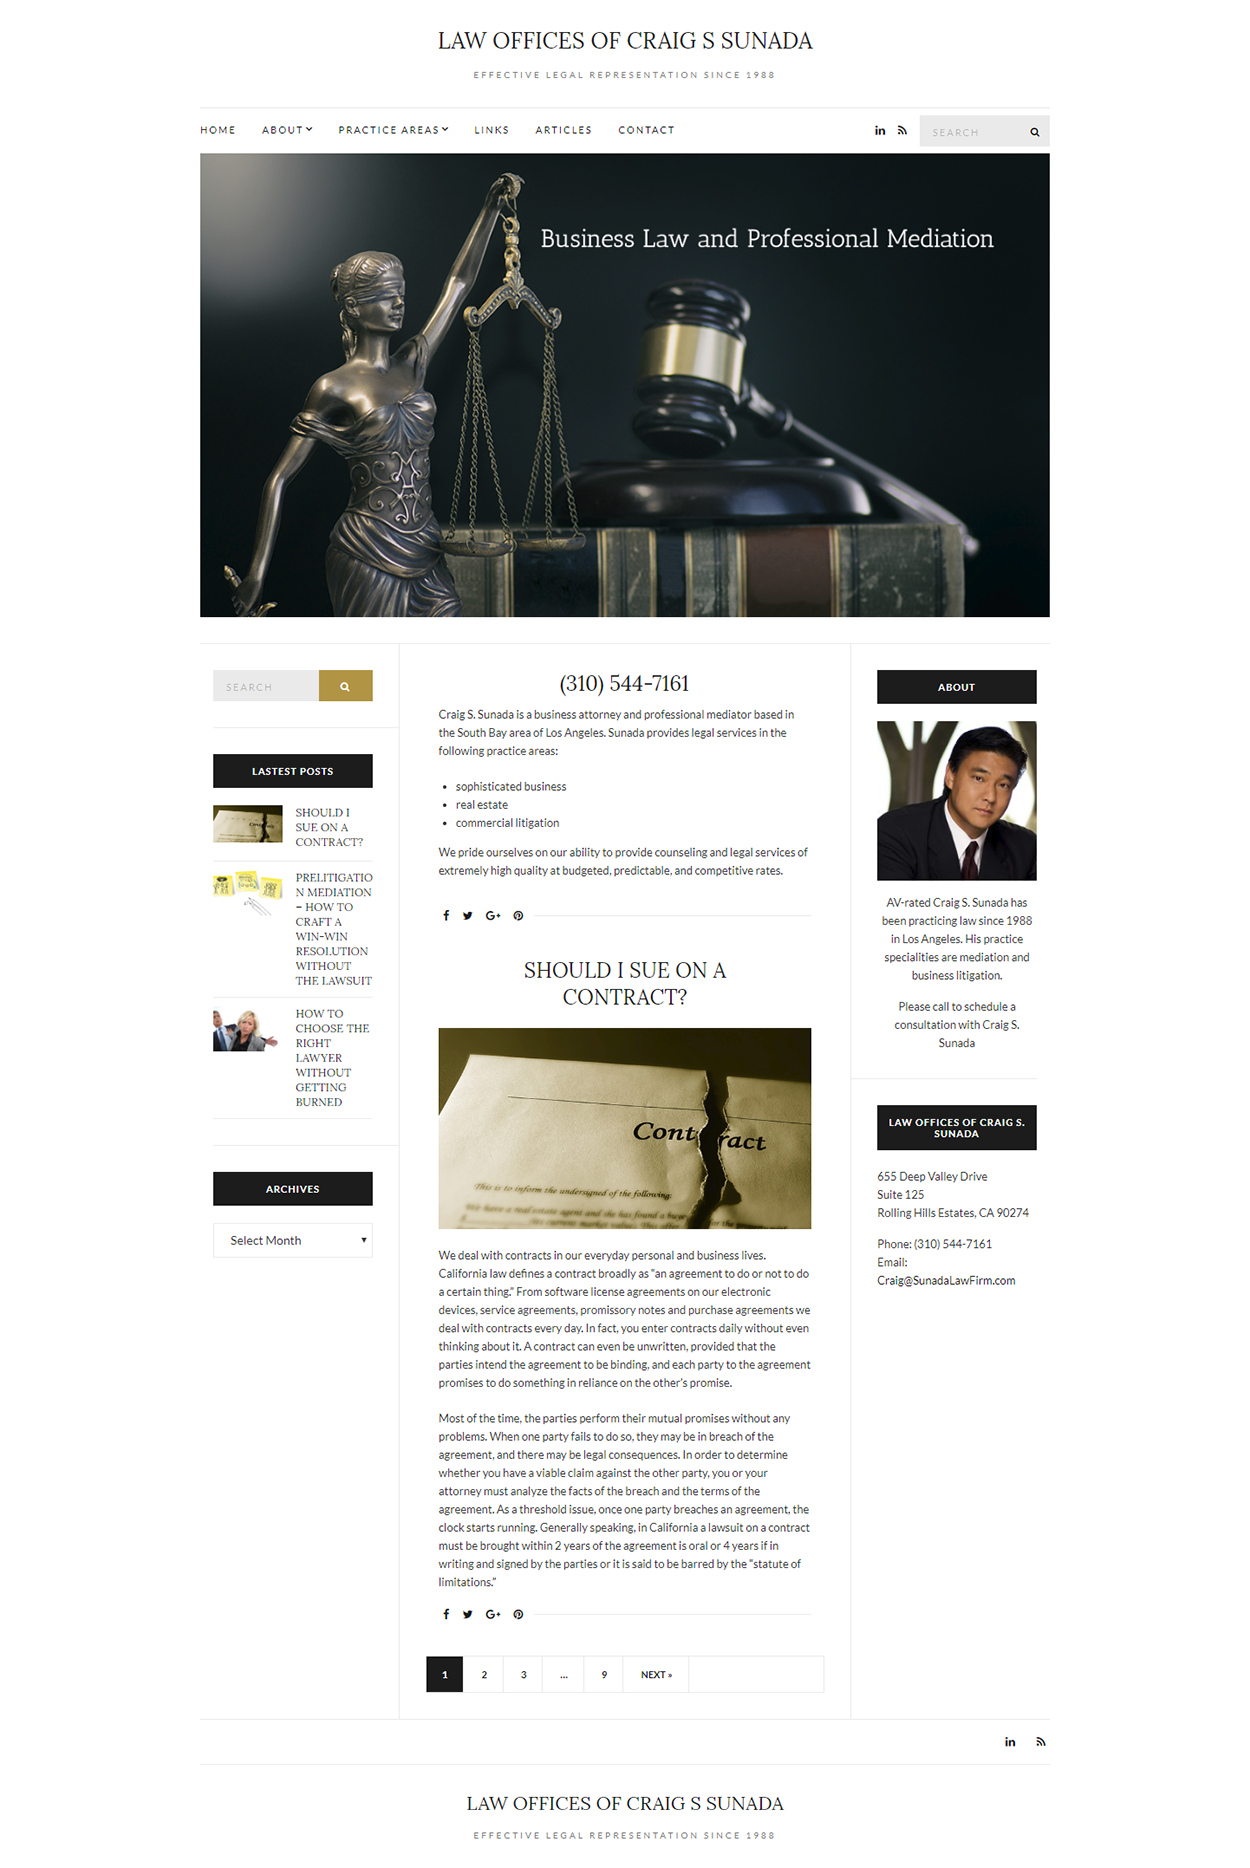 Law Offices of Craig S Sunada website design